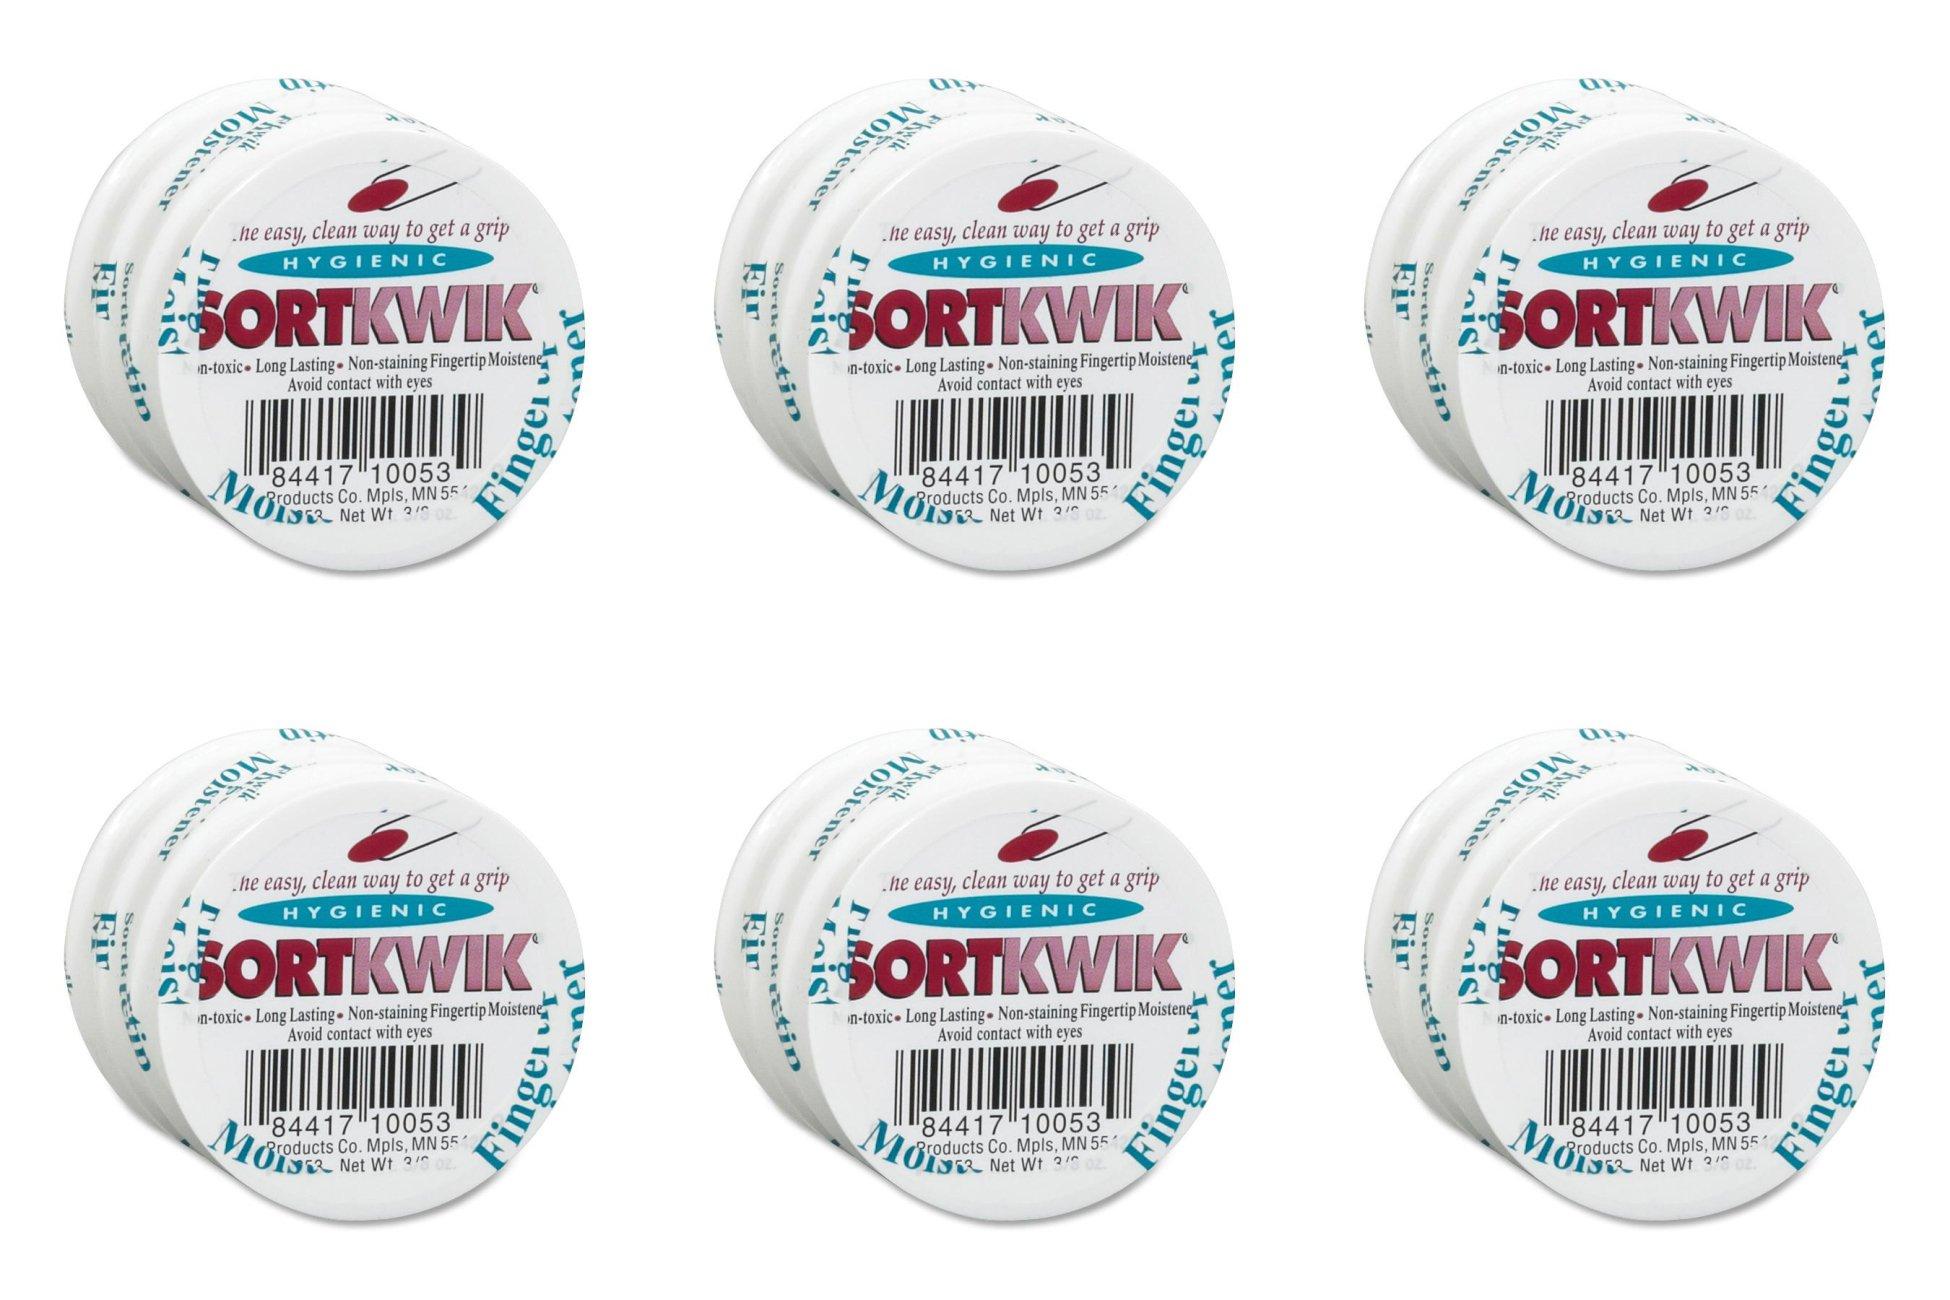 Lee Sortkwik Fingertip Moistener, 3/8 oz, 6 Sets of 3 Packs